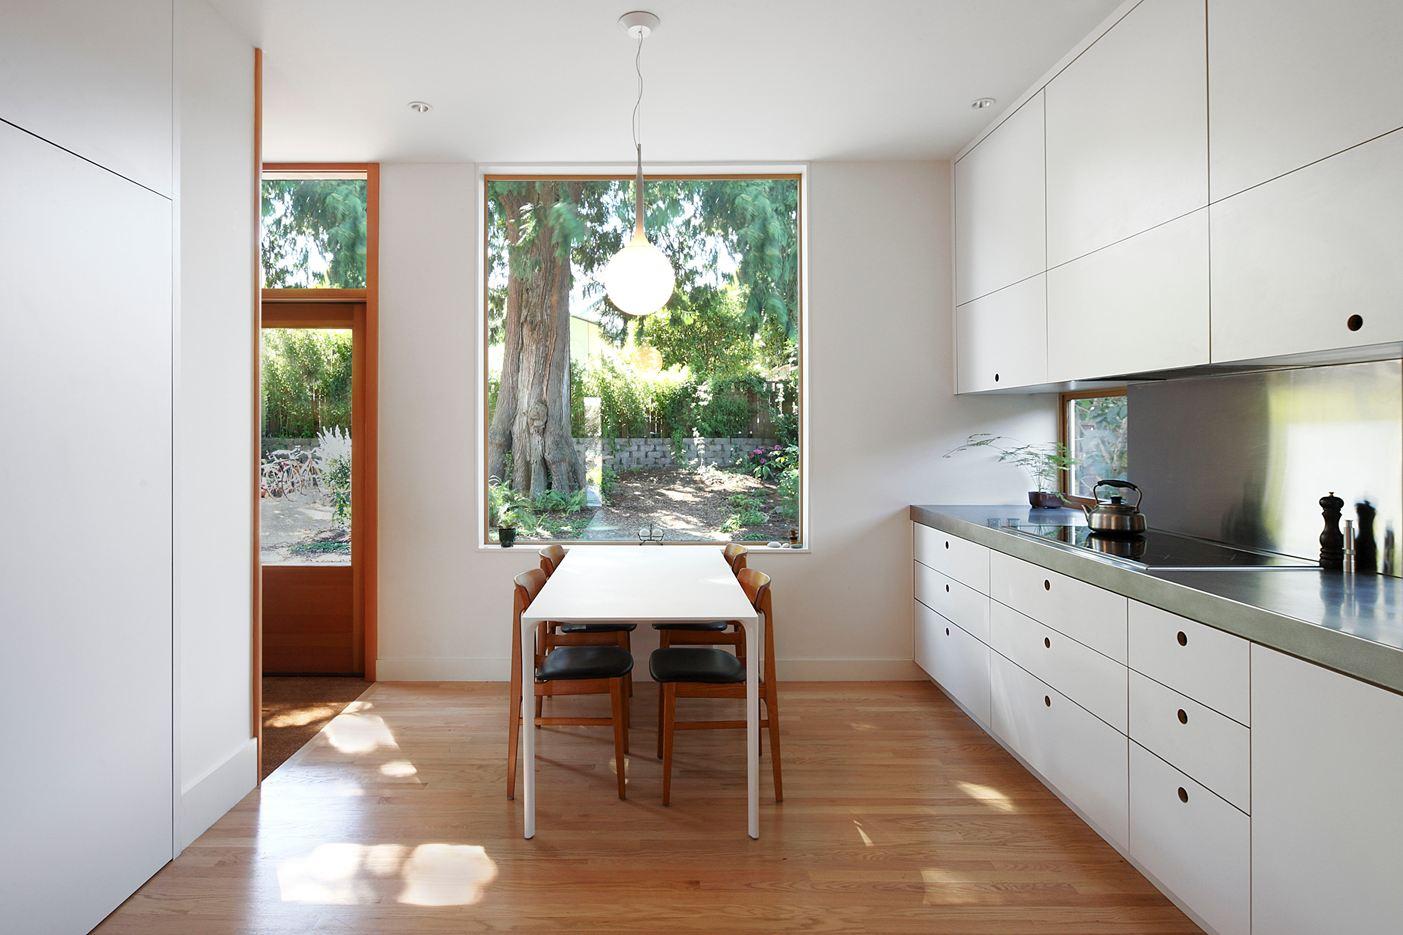 ^ Magnolia emodel in Seattle, Washington by SHD rchitecture ...